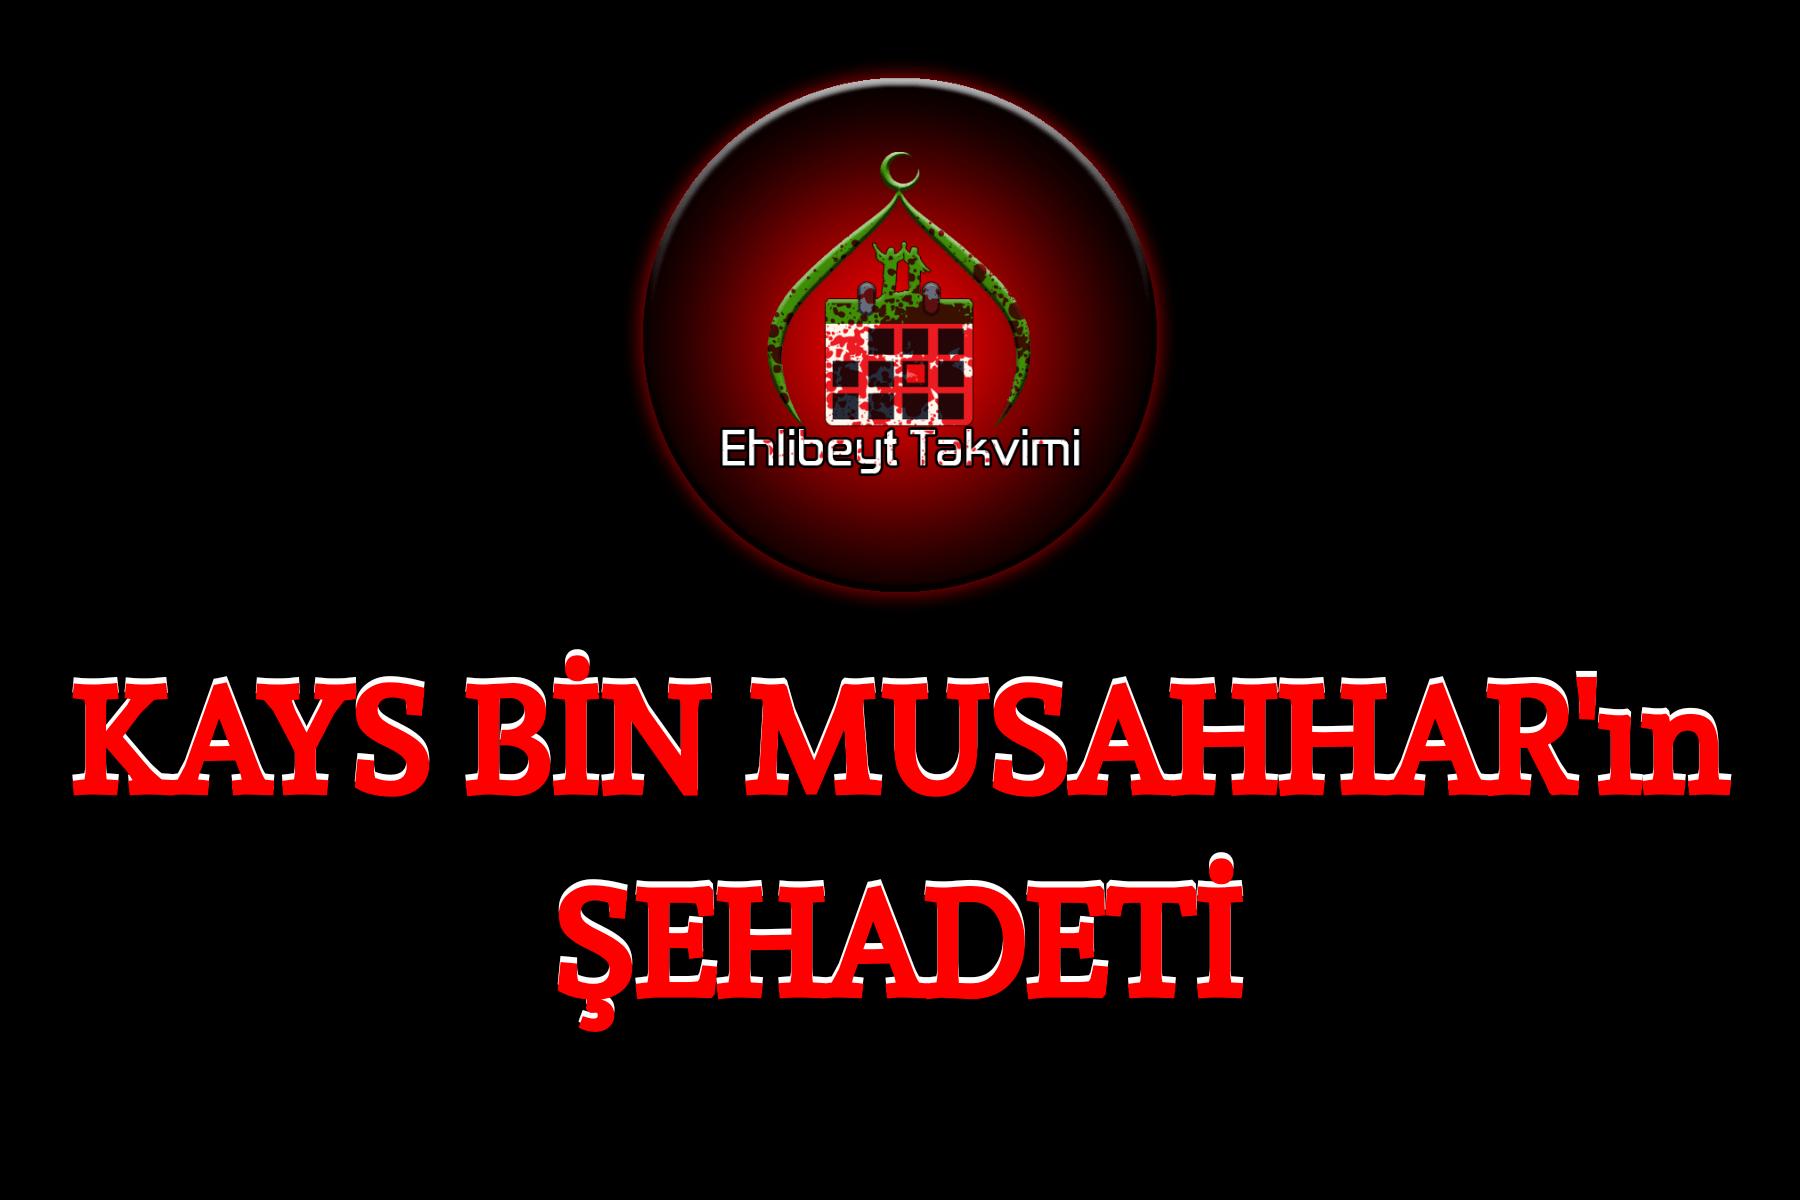 Kays Bin Musahhar